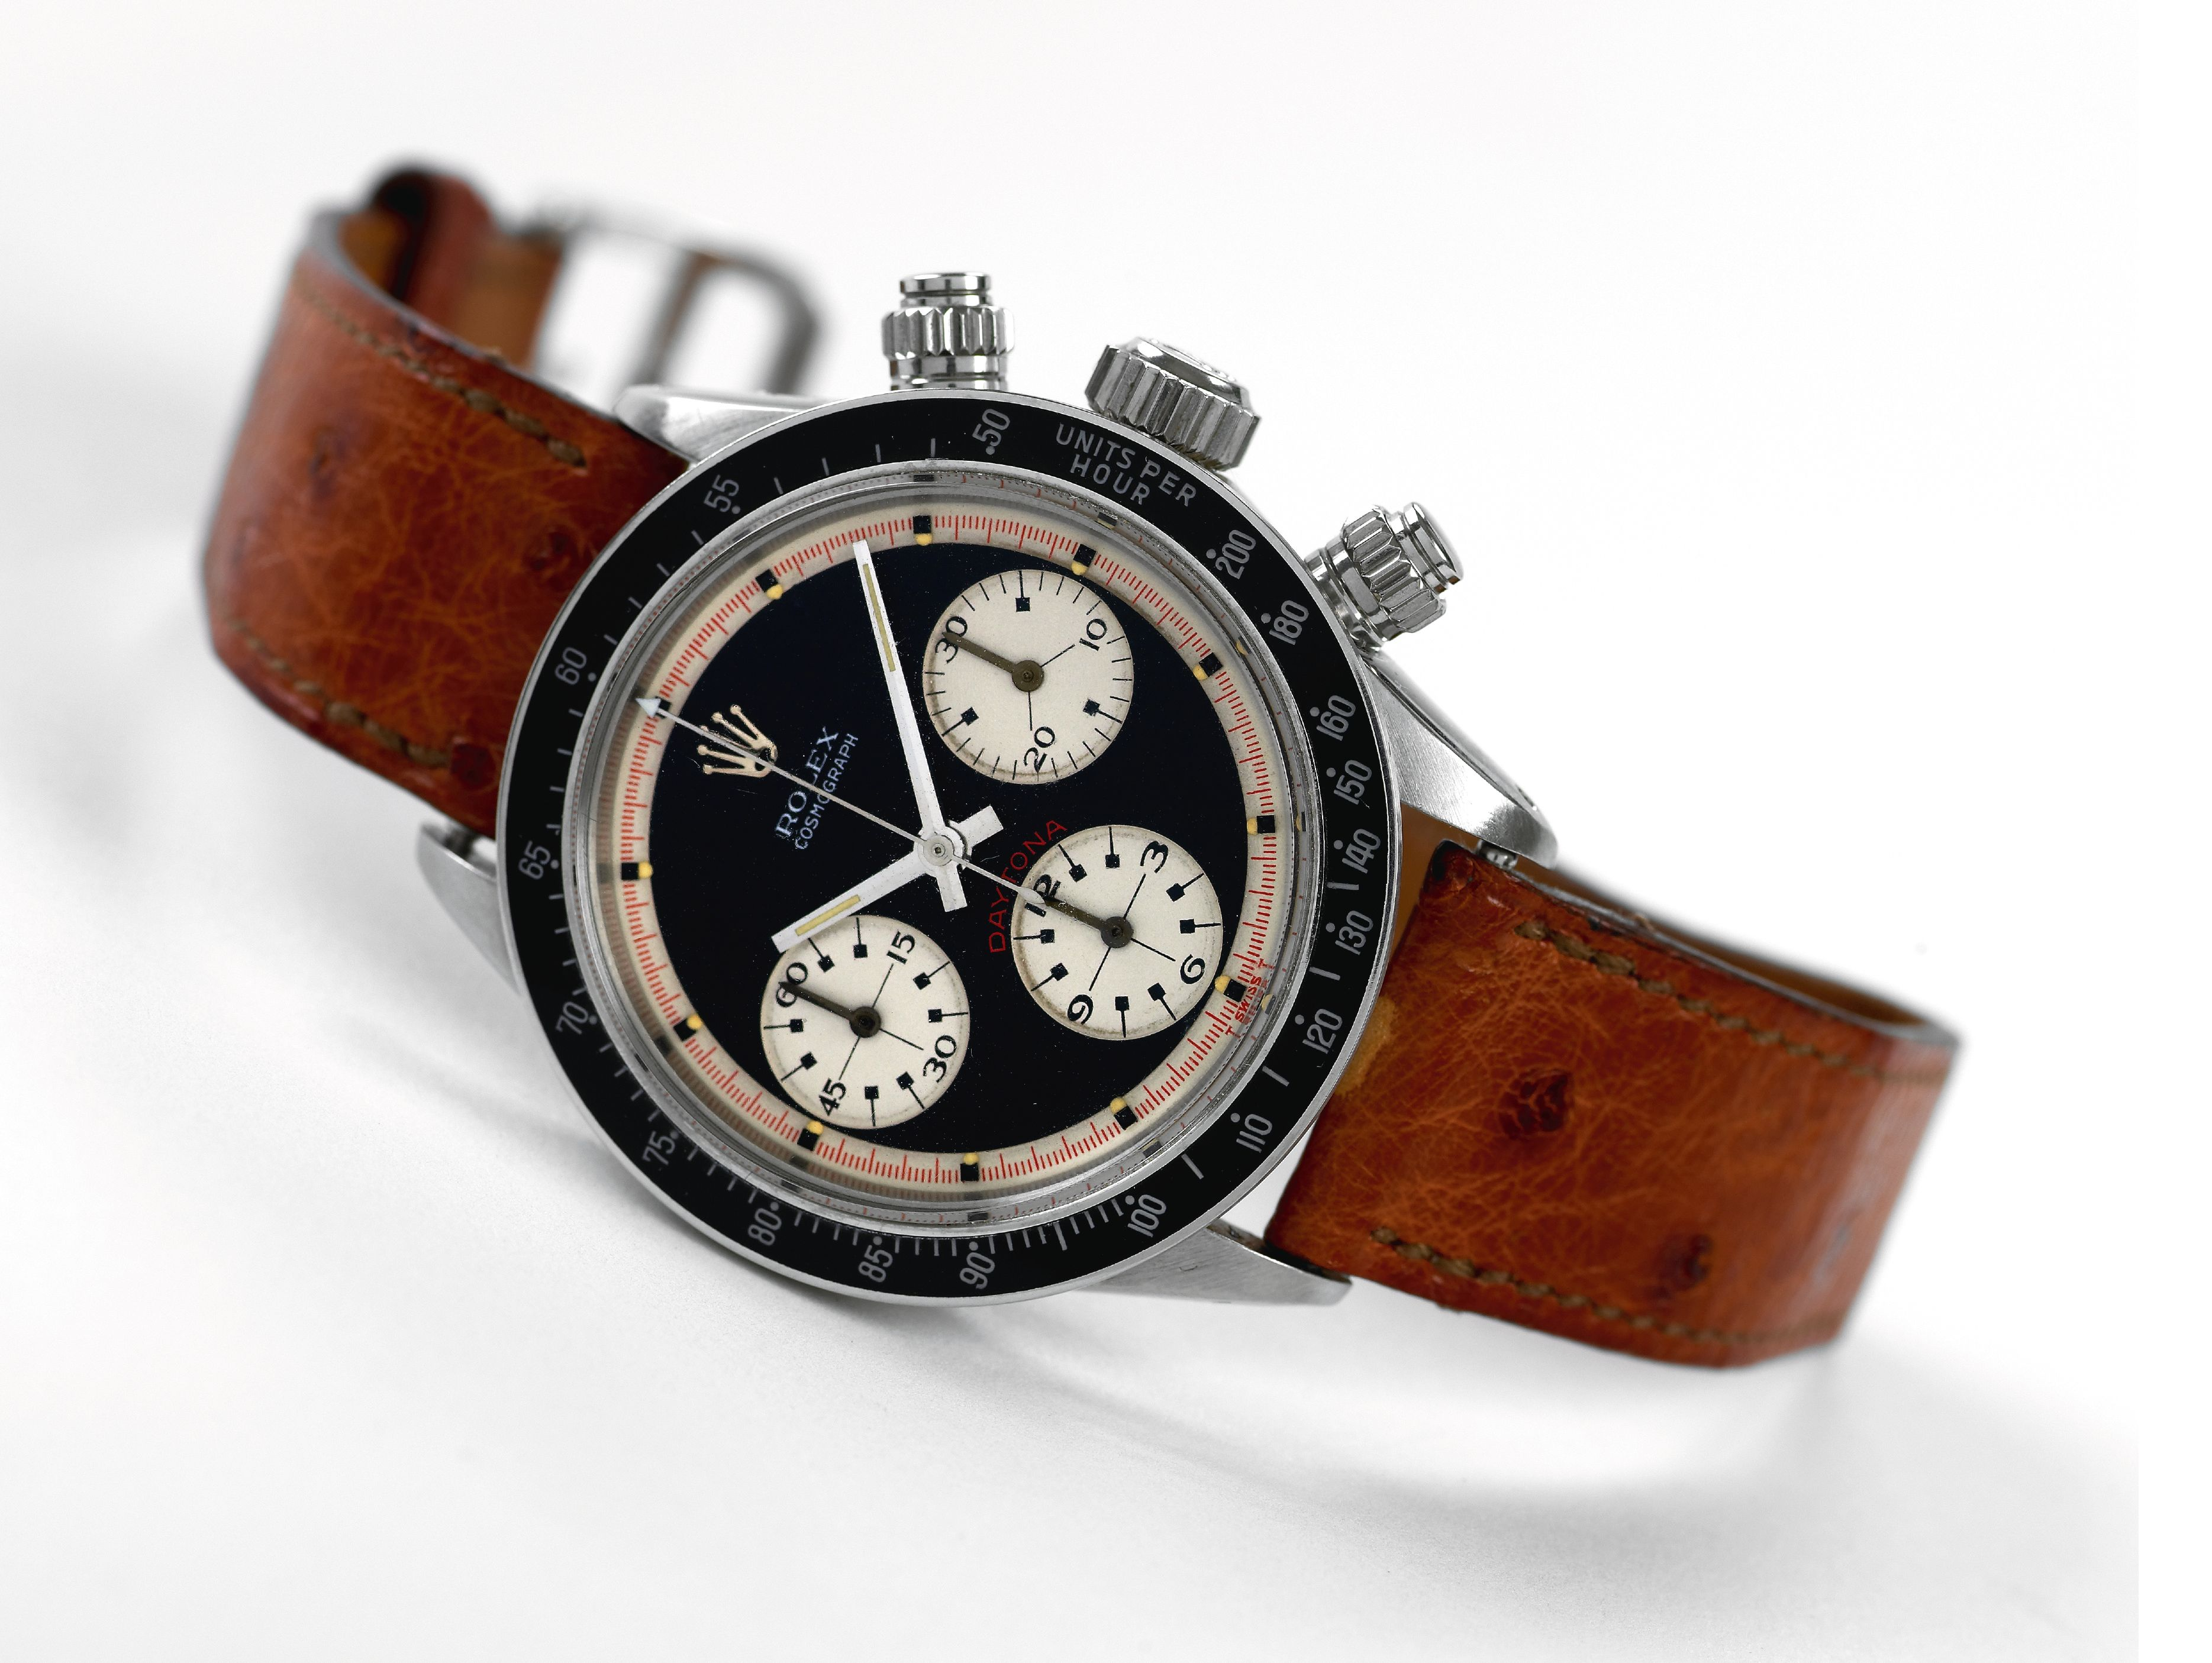 Paul Newman Rolex Cosmograph Daytona Ref 6263 Watch Vintage Watches Watches For Men Rolex Daytona Watch